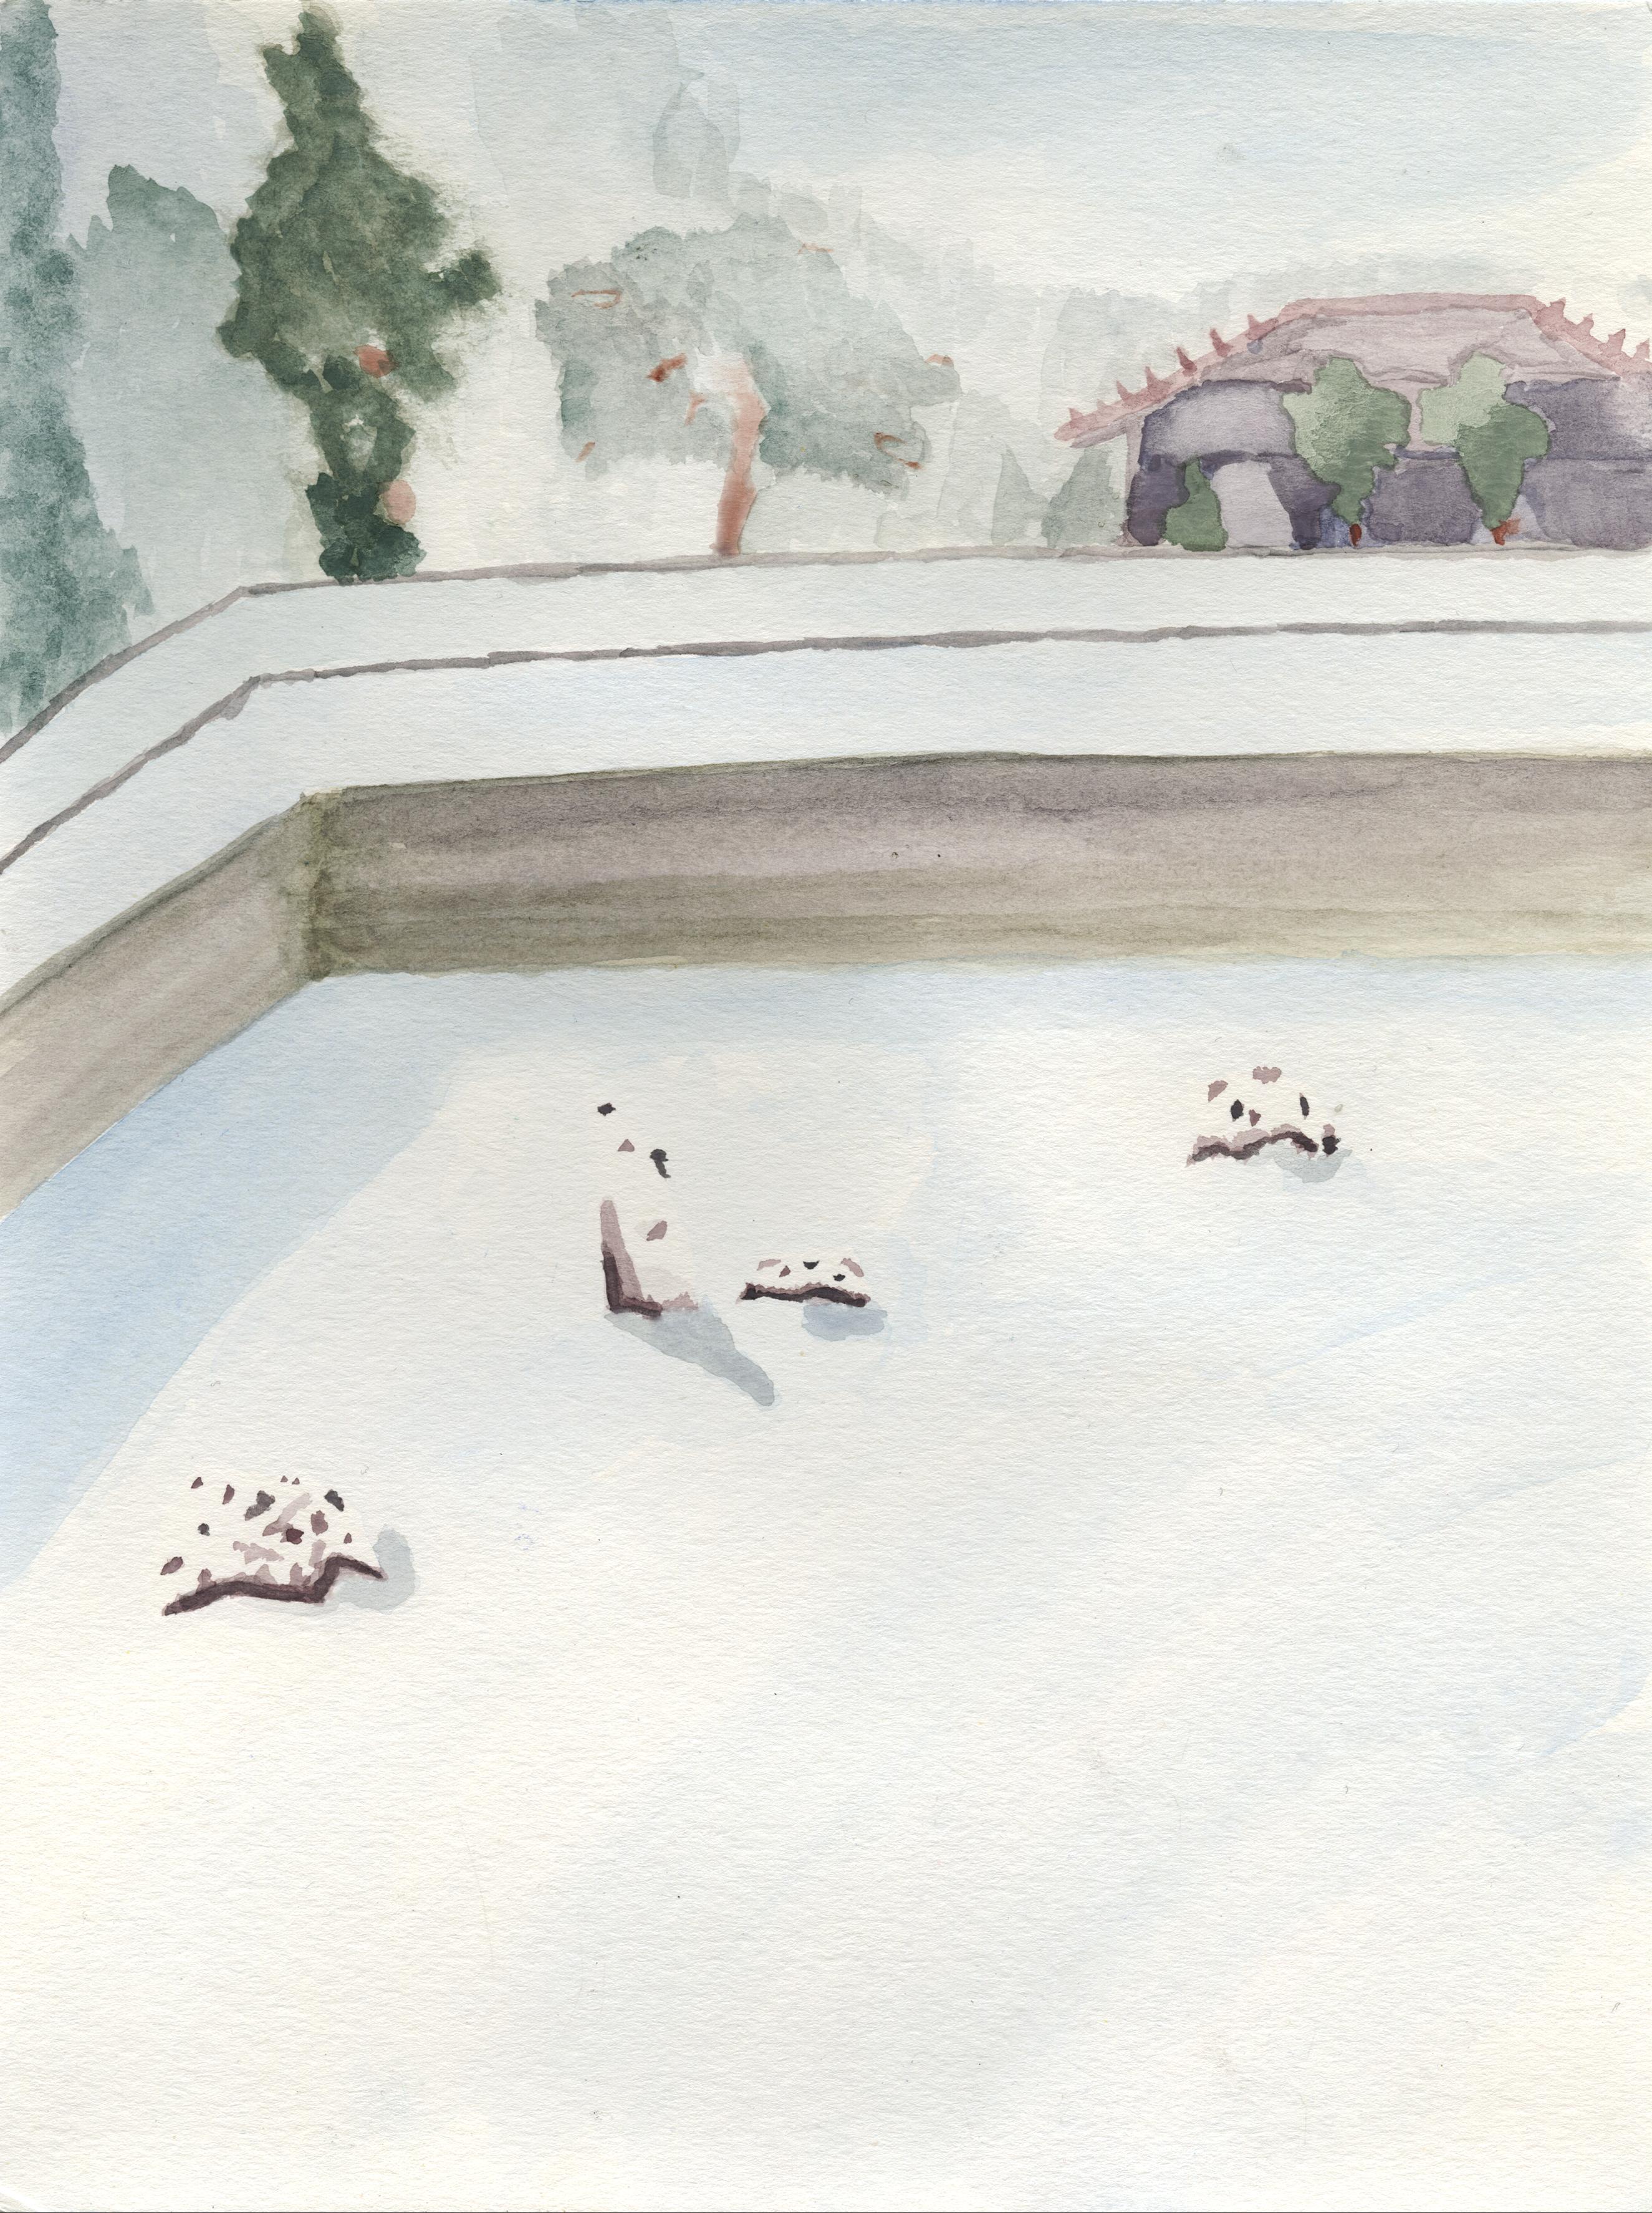 Ryōan-ji: Snow